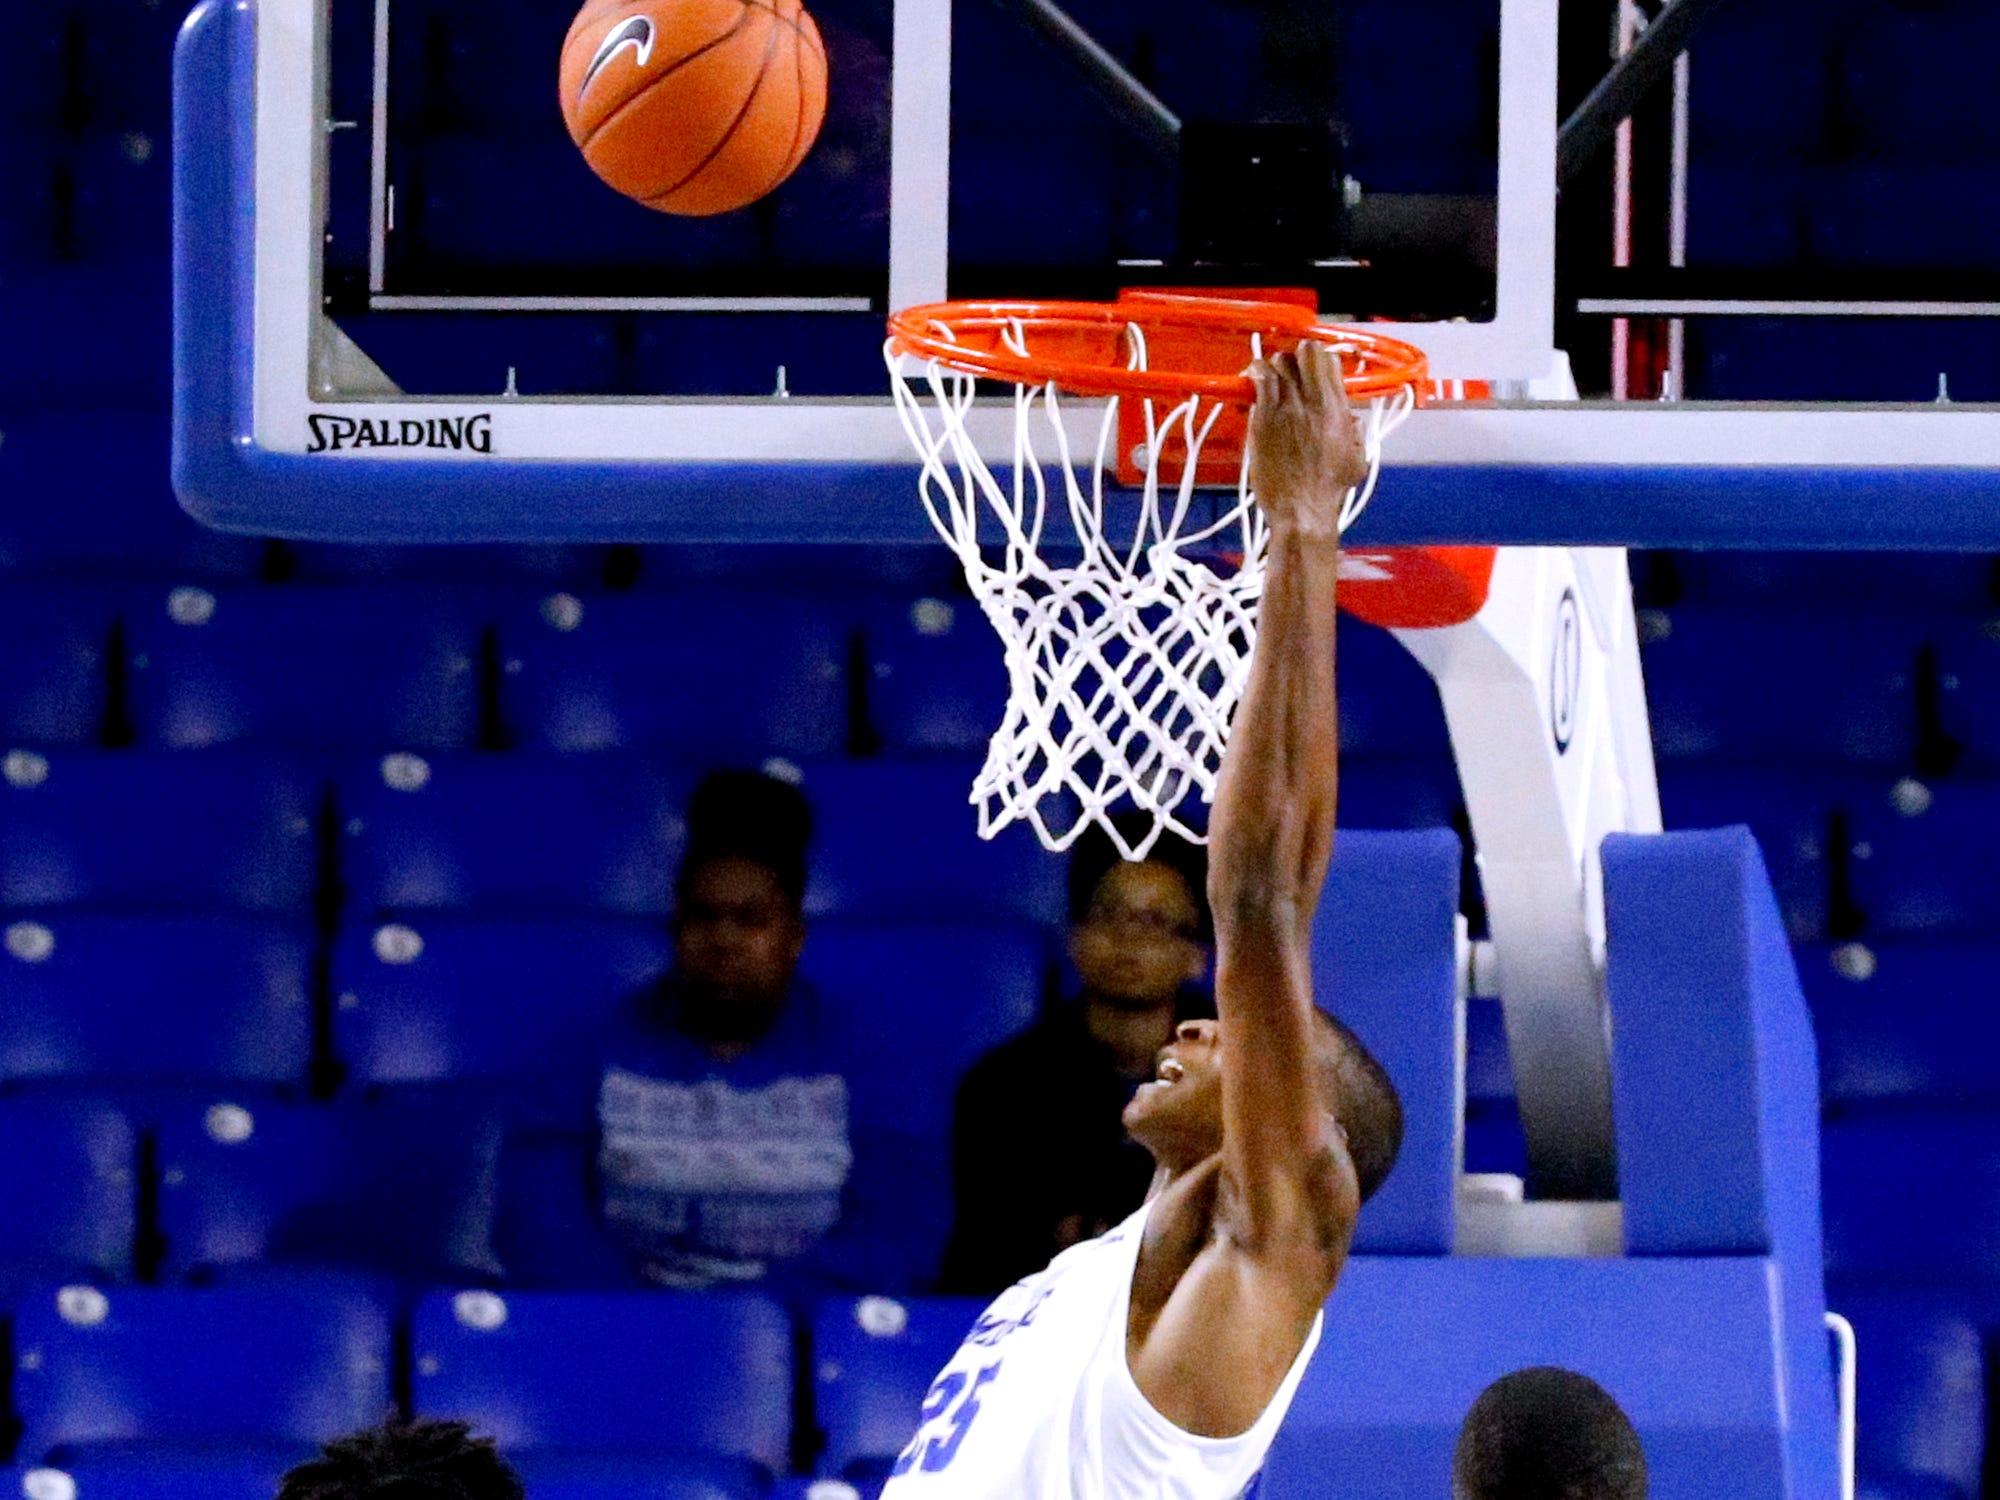 MTSU's Karl Gamble (25) misses a dunk shot against Lees-McRae on Tuesday, Nov. 6, 2018.